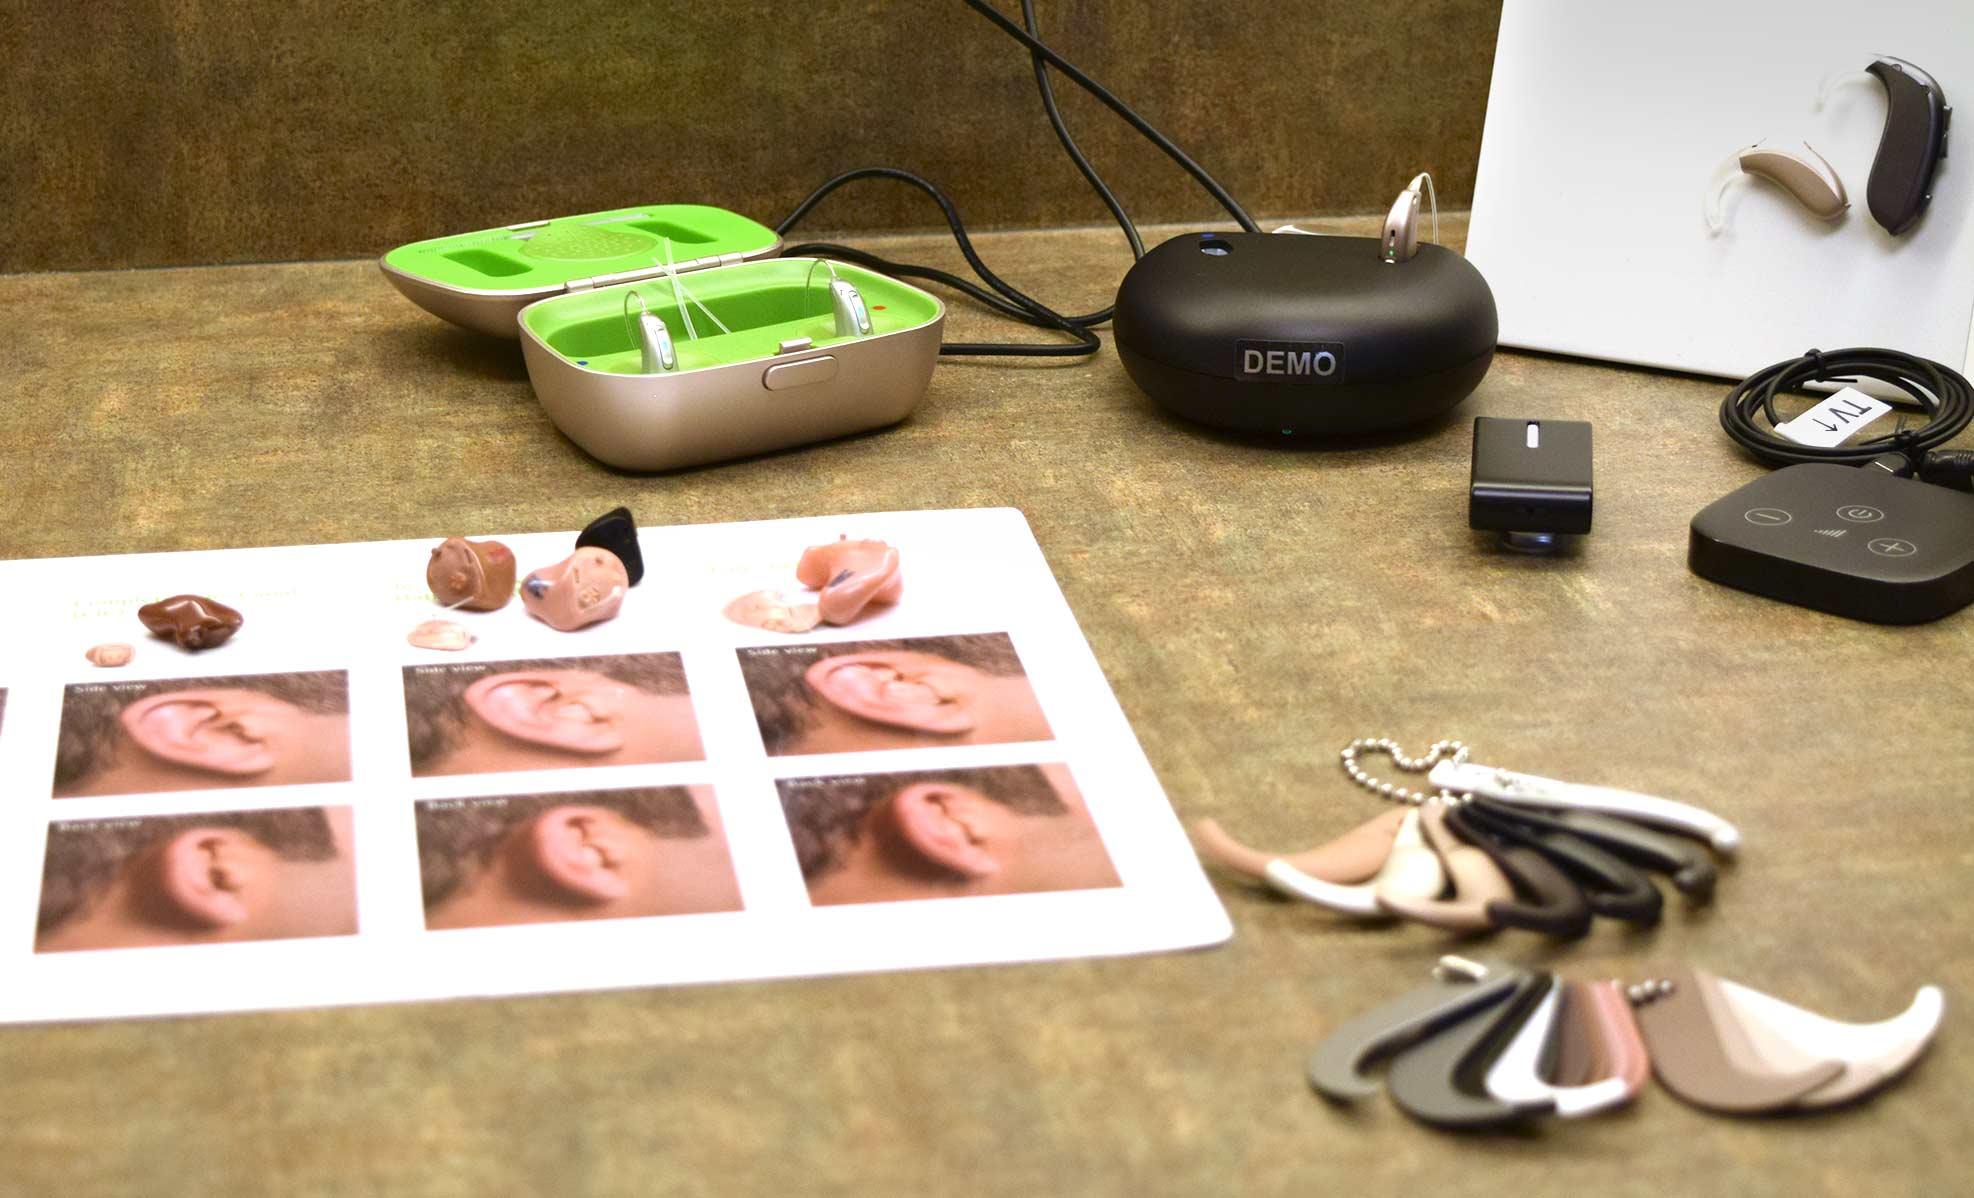 Hearing aid customization kit